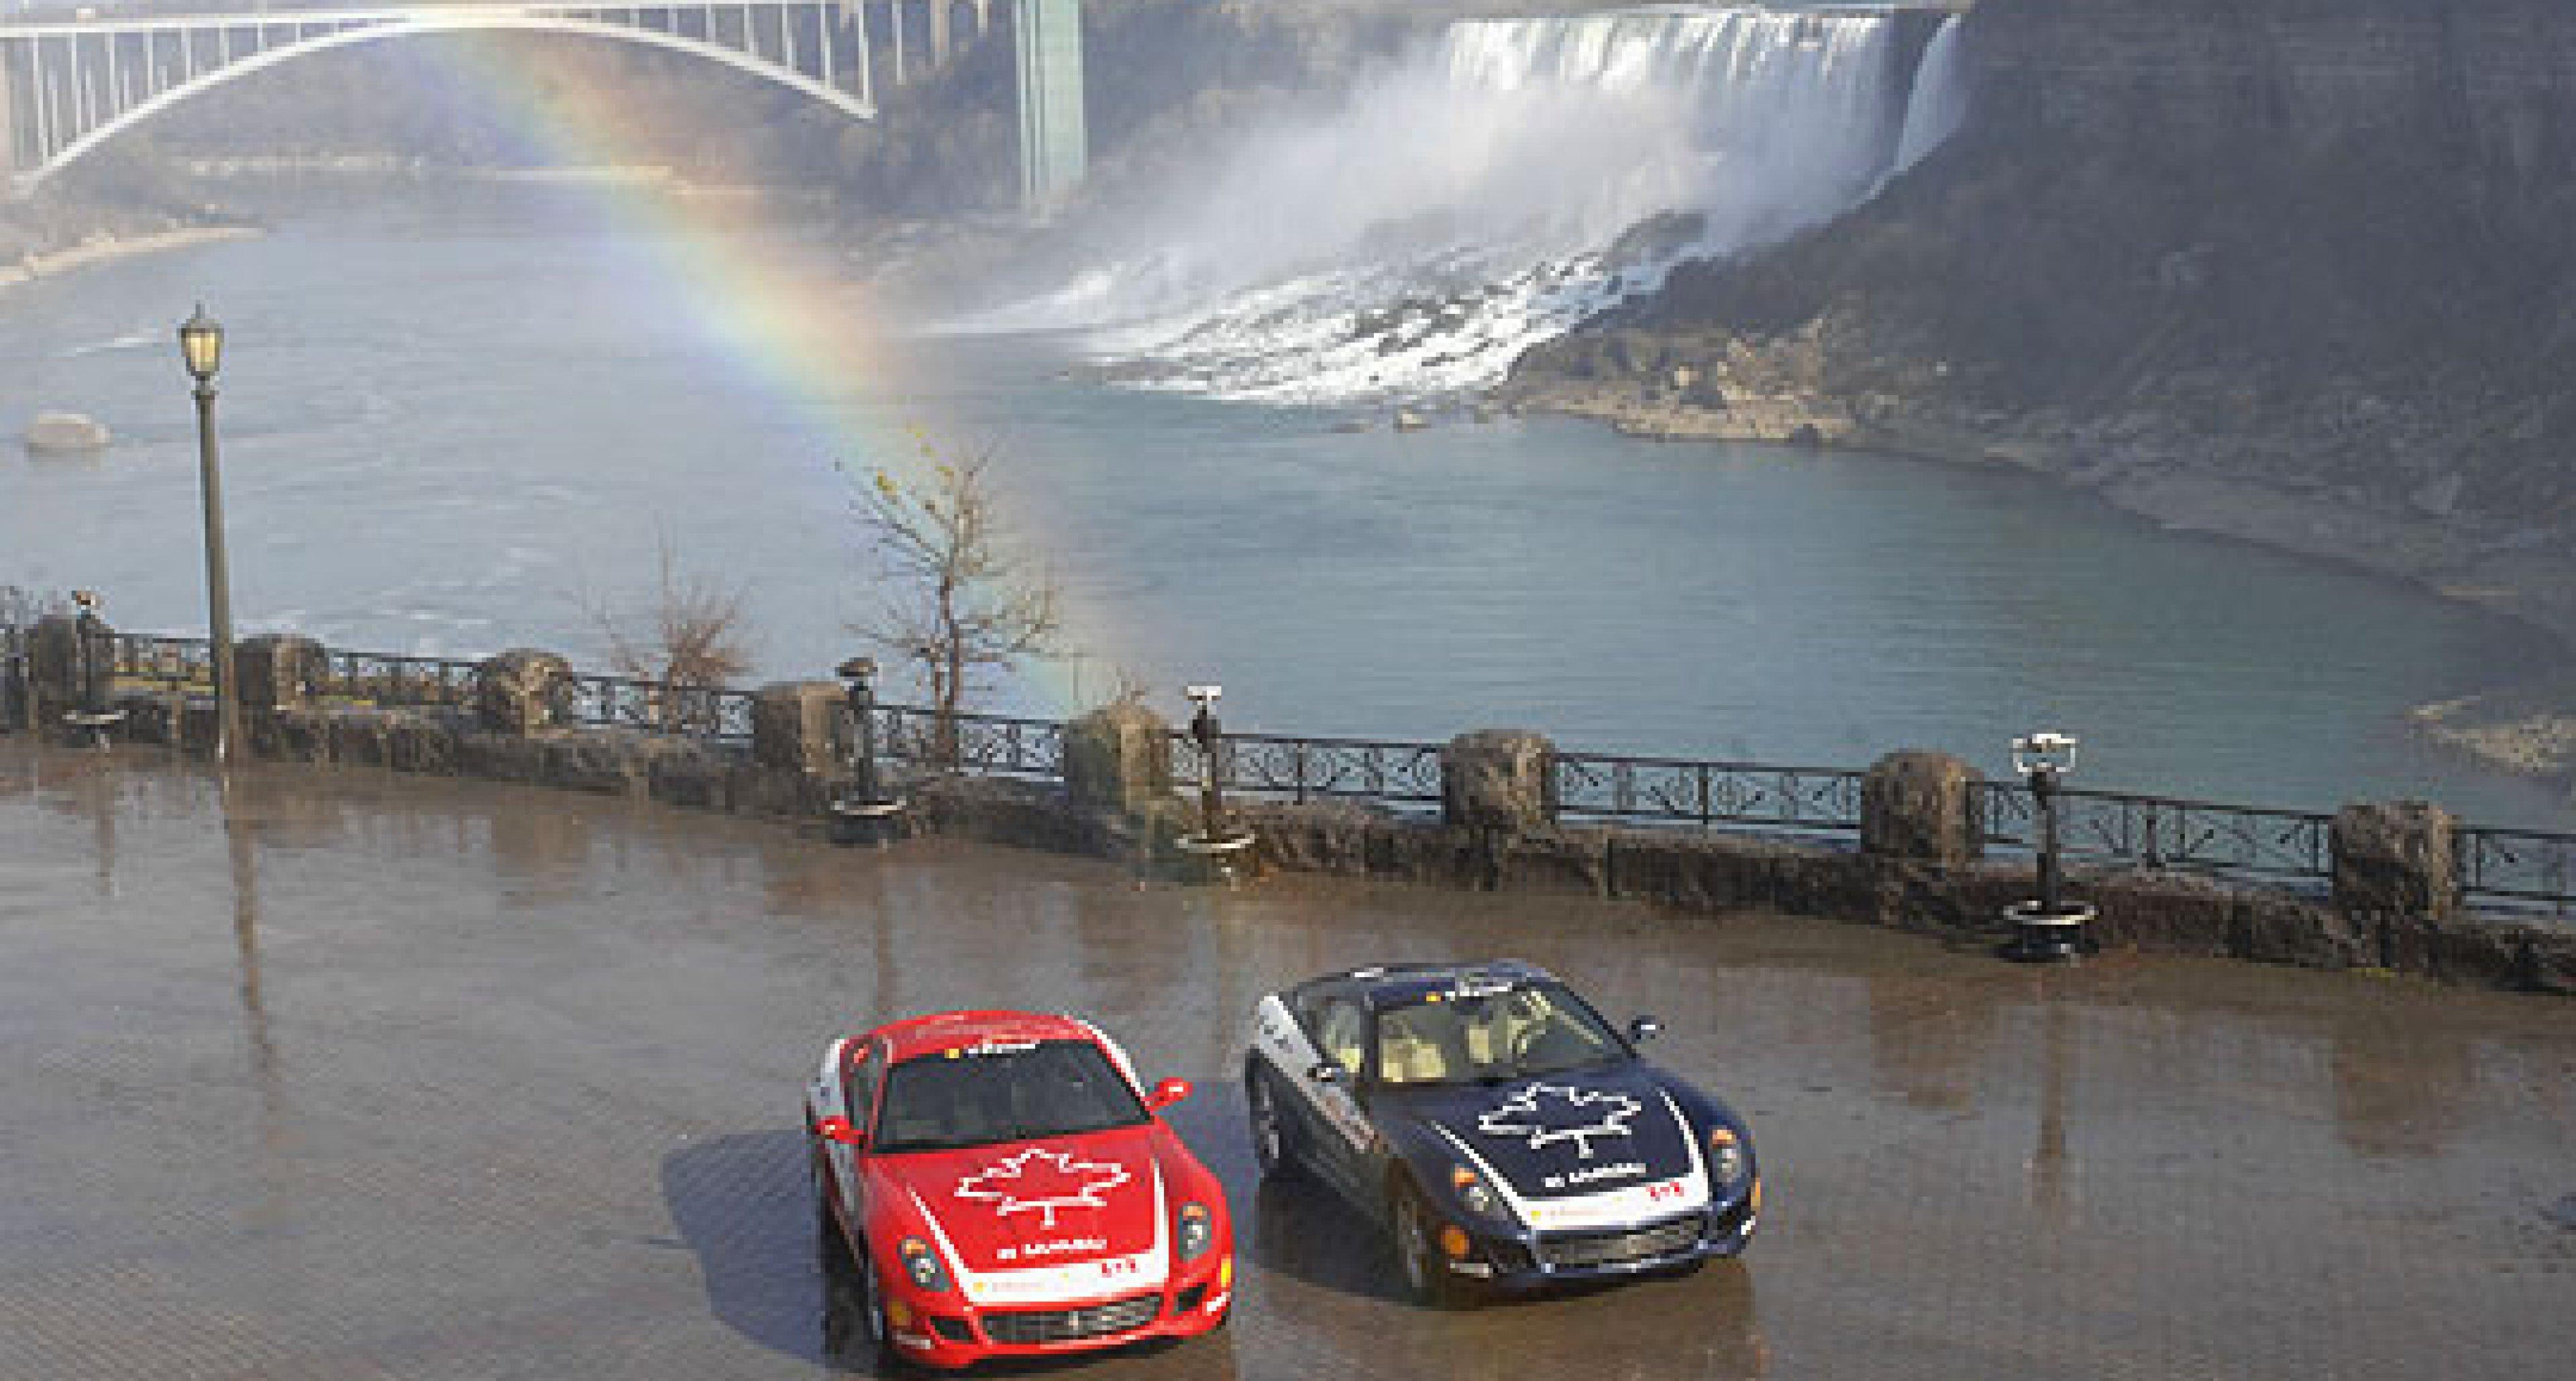 Ferrari Panamerican 20,000 - the final stint